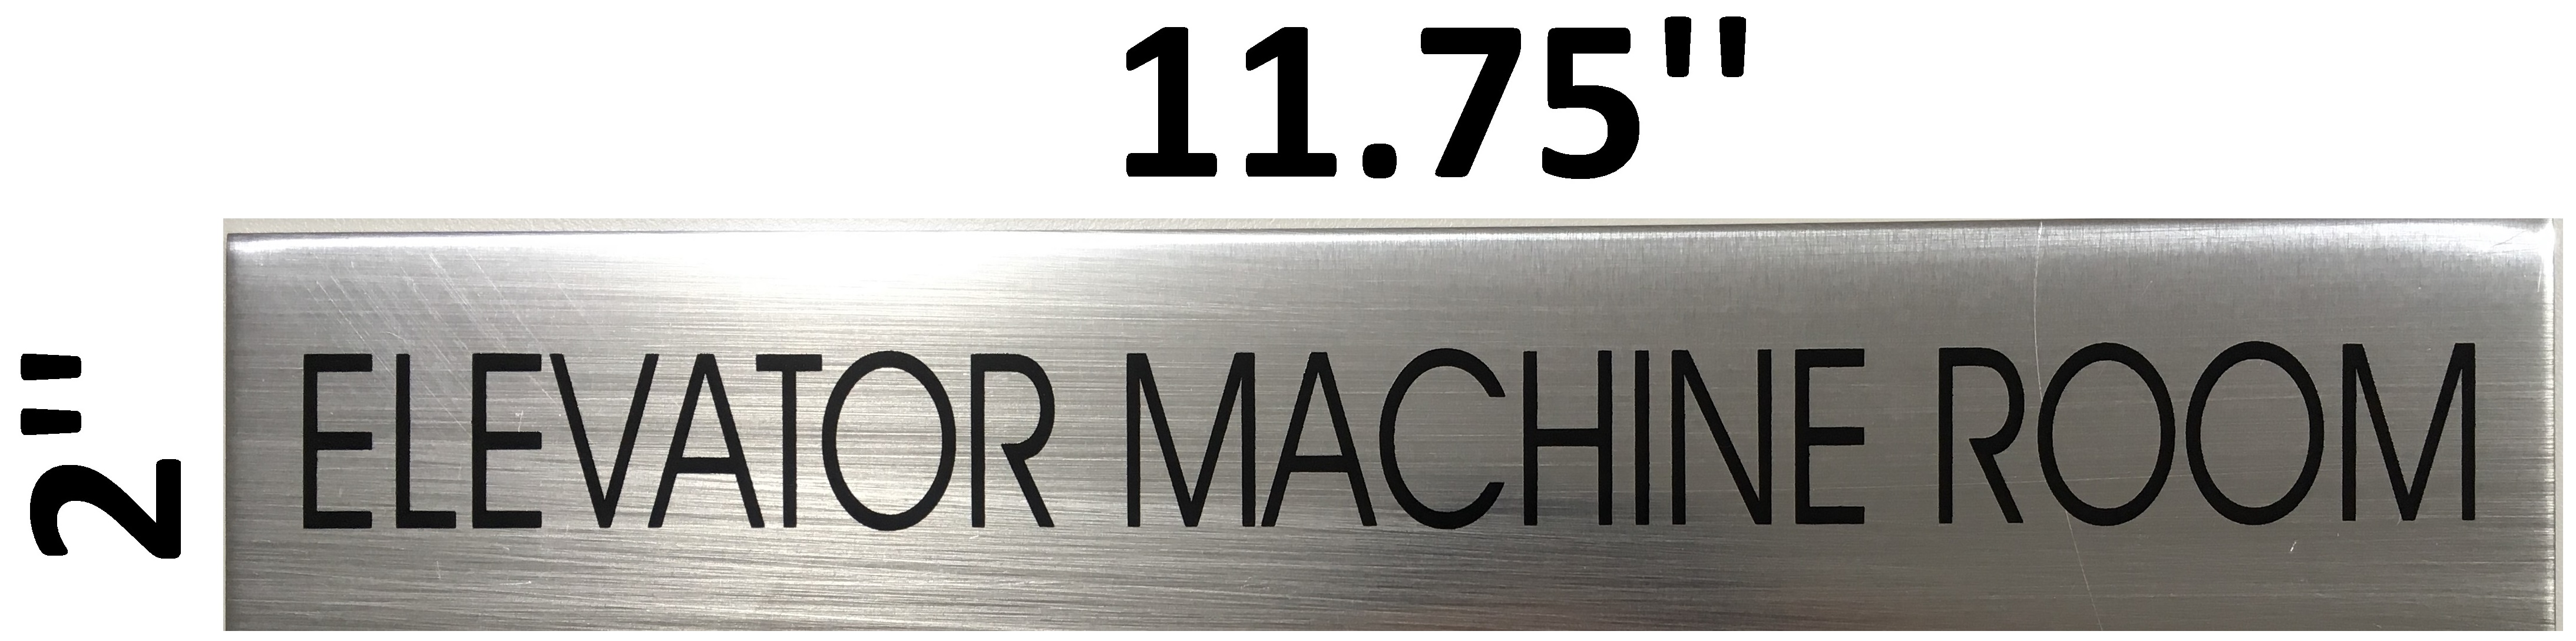 BRUSHED ALUMINUM ELECTRIC METER ROOM SIGN ALUMINUM SIGN SIZED 2/'/'X11.75/'/'